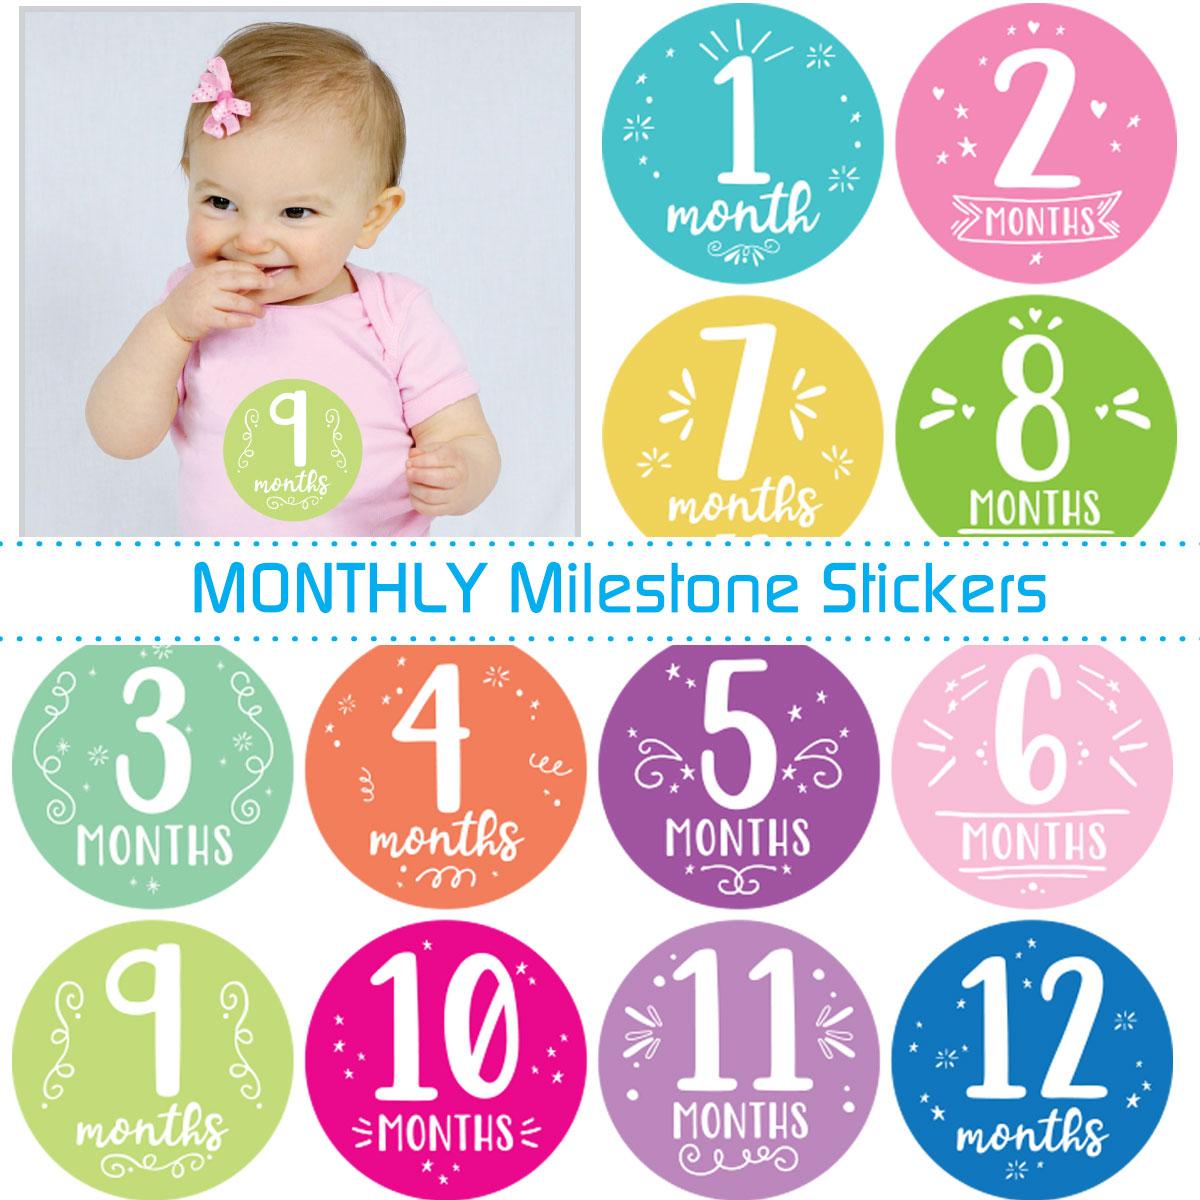 Monthly Milestone Baby Stickers Pastel Pinks